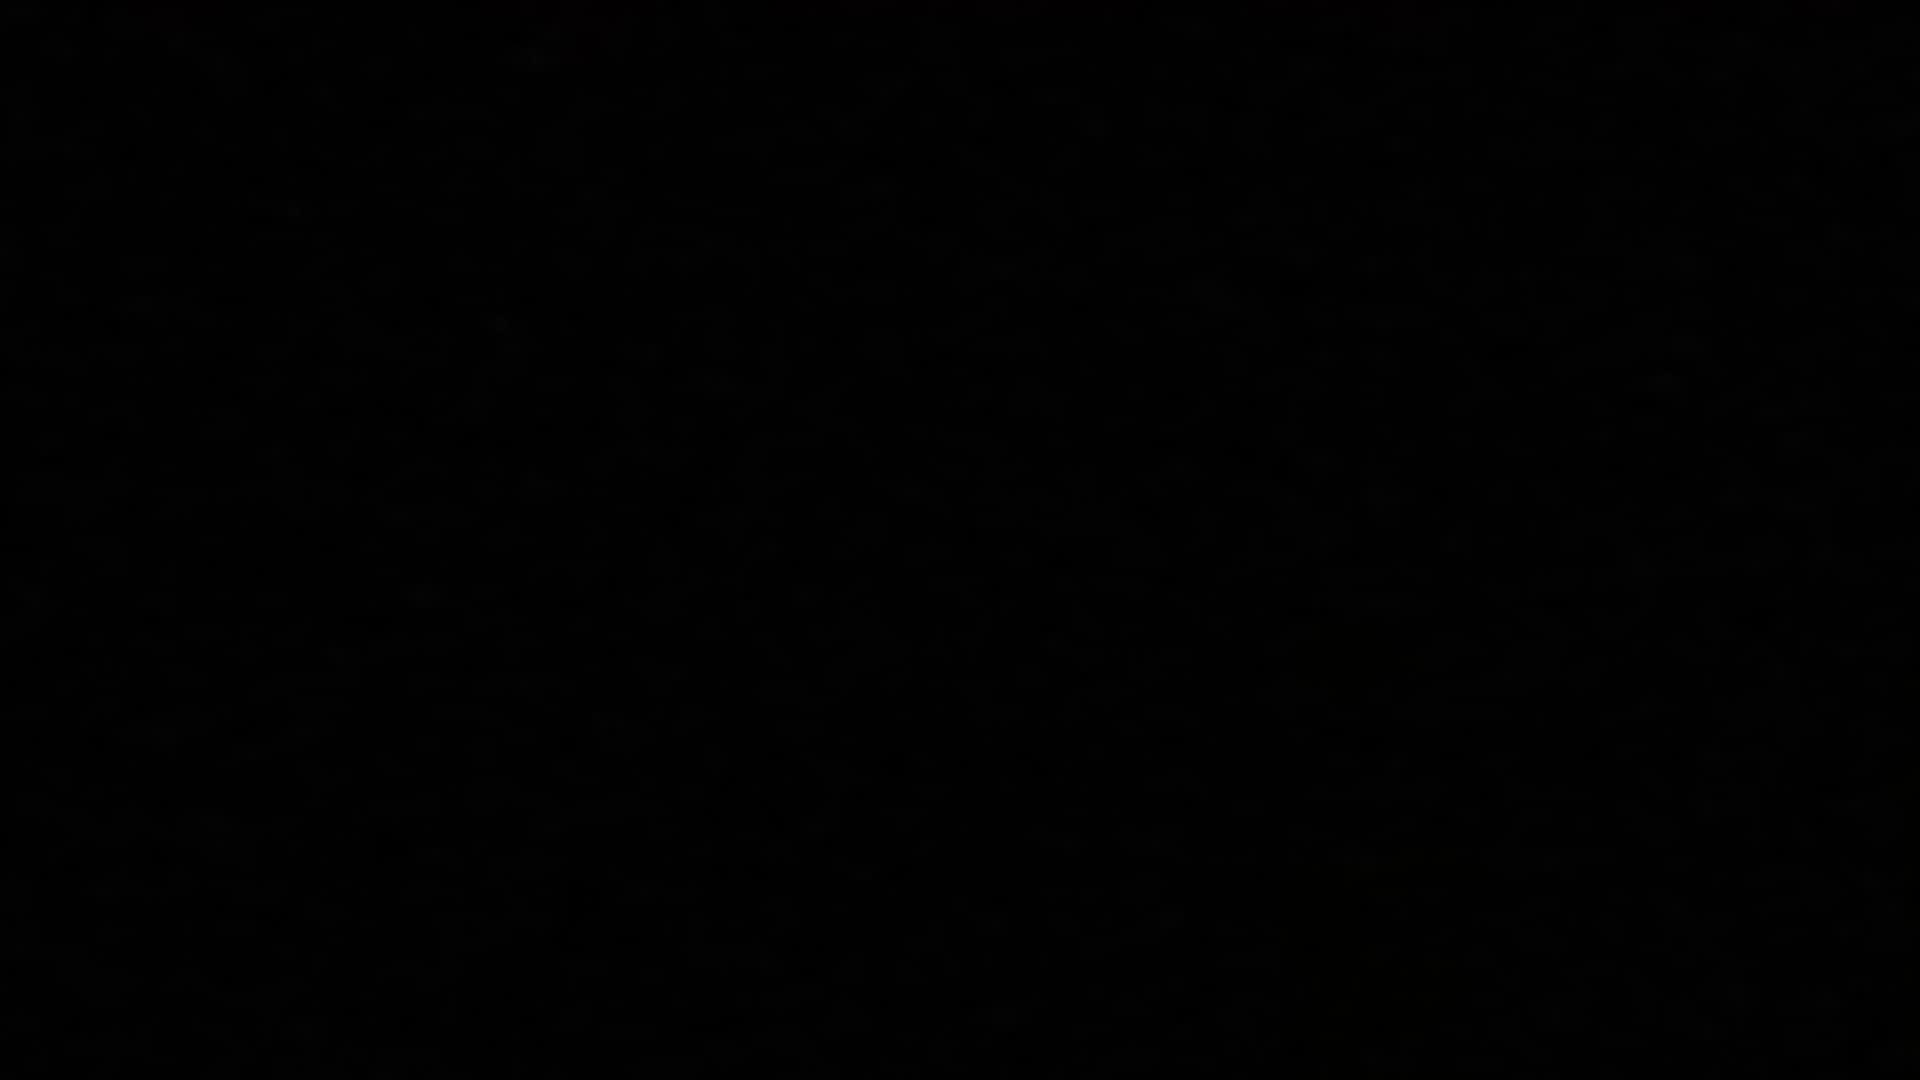 SPYさん初投稿!マンション覗き!5000K!ハイビジョン撮影VOL.05(元サッカー部員社会人) 私服 男同士動画 75連発 16